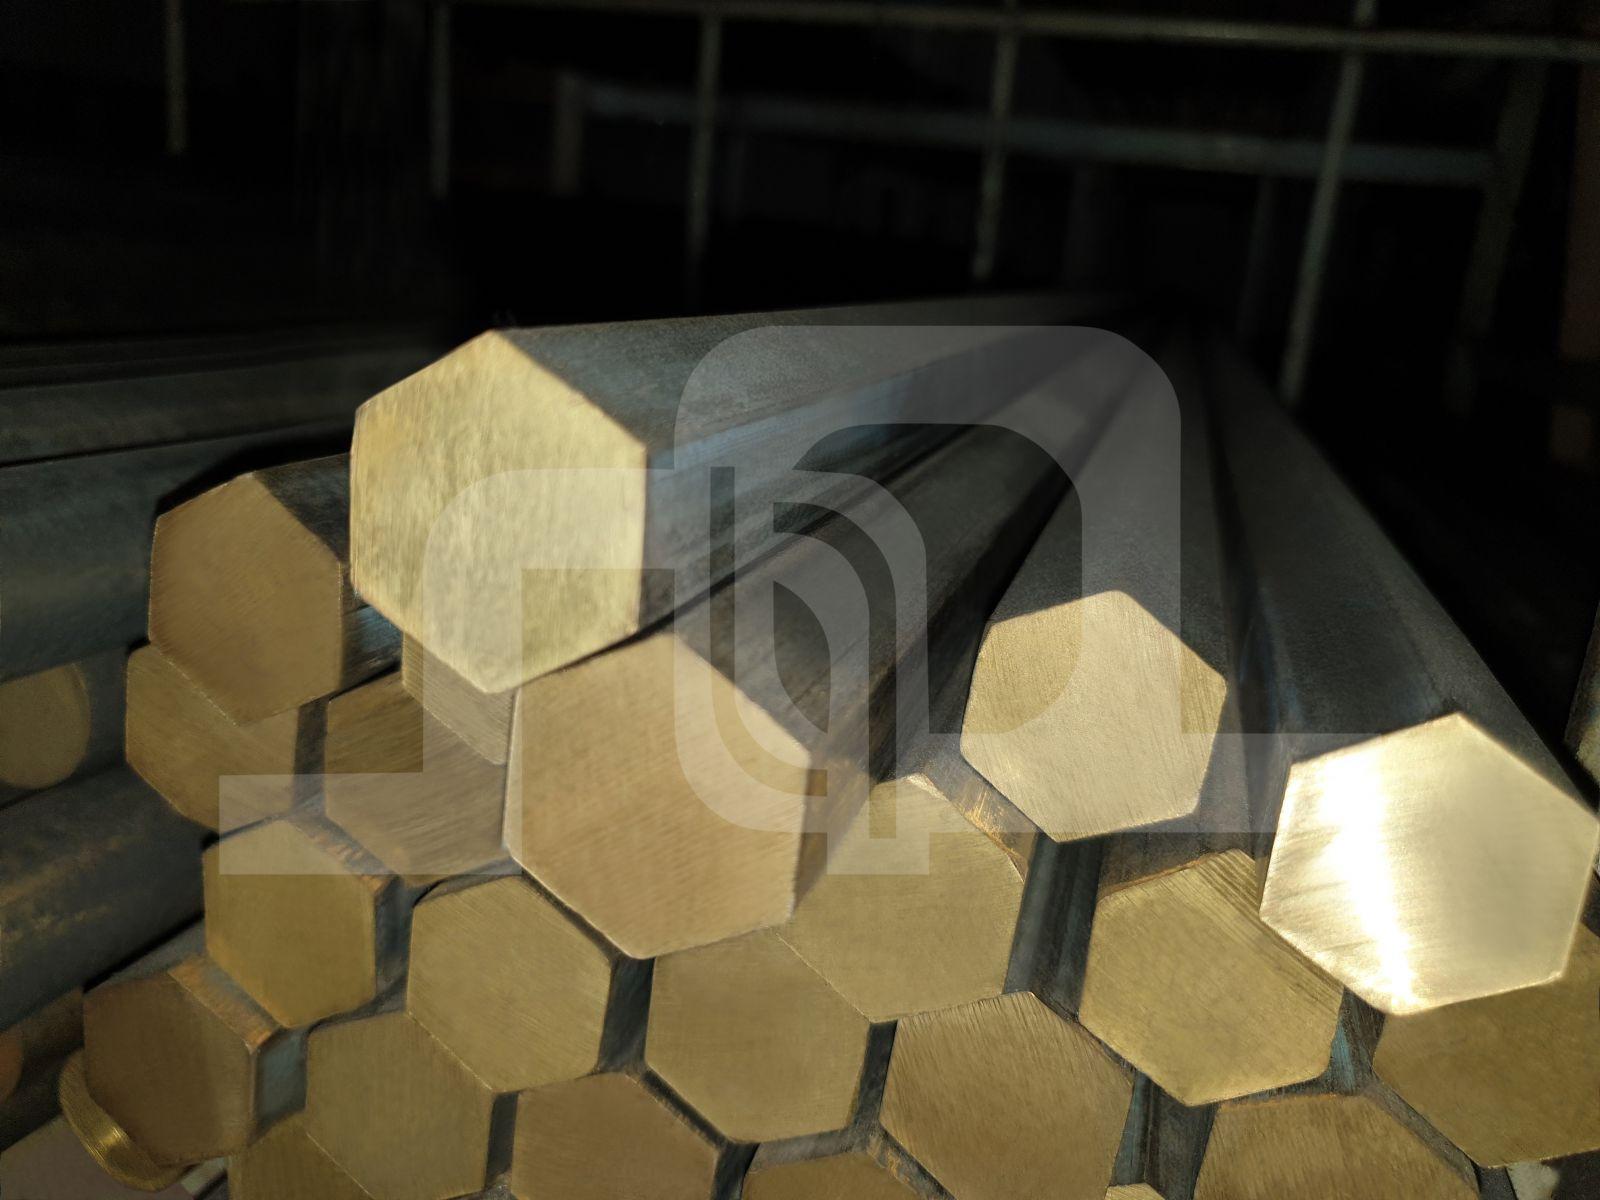 Unpeeled Brass Haxegon Rod